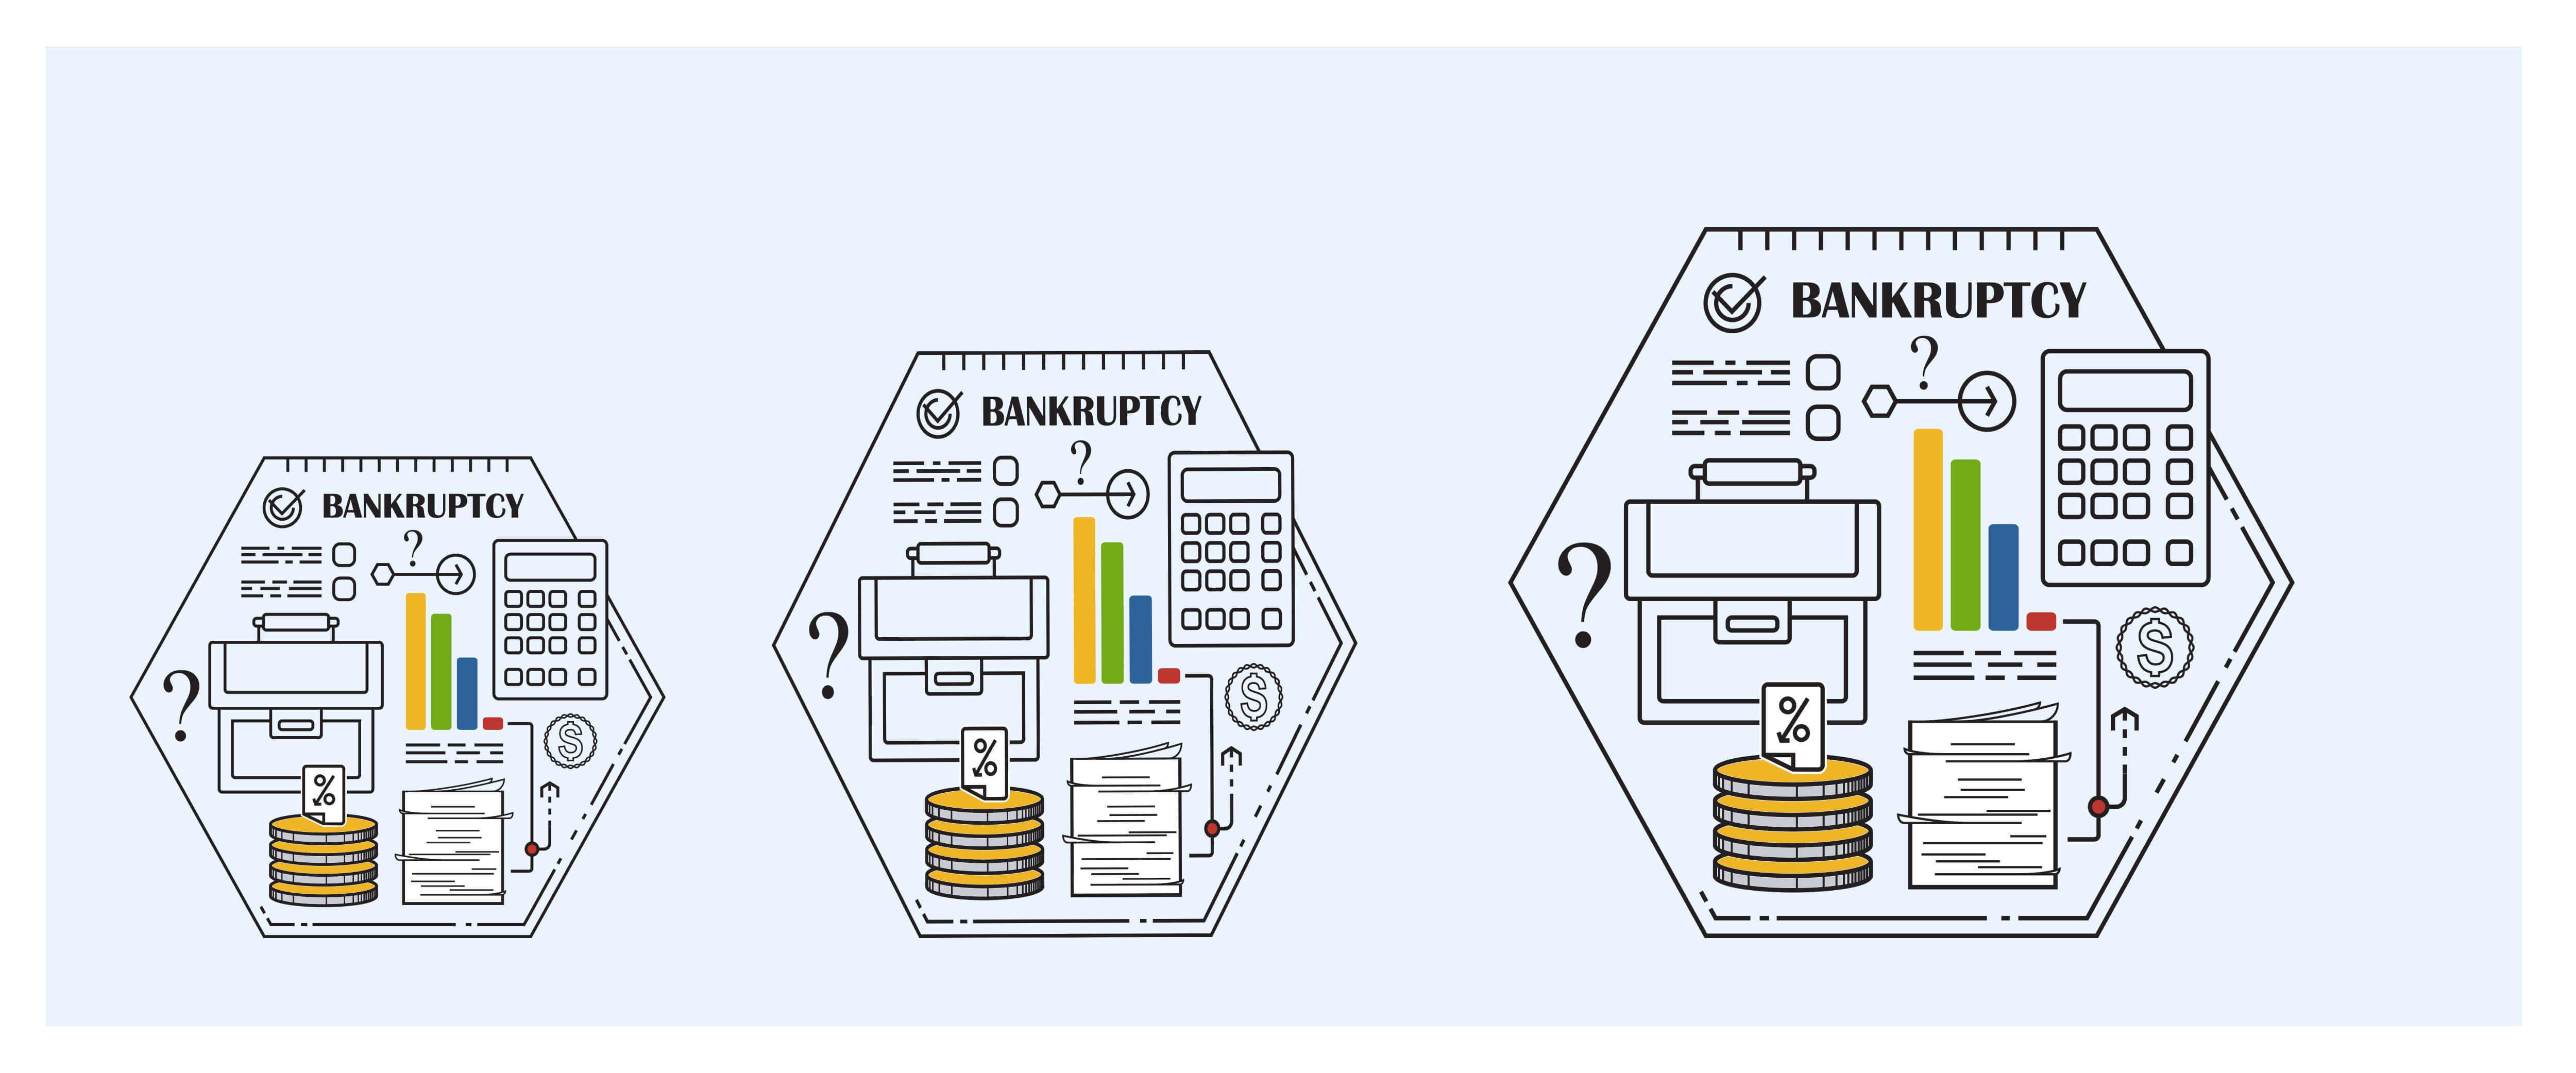 事業の再構成 事業管理図